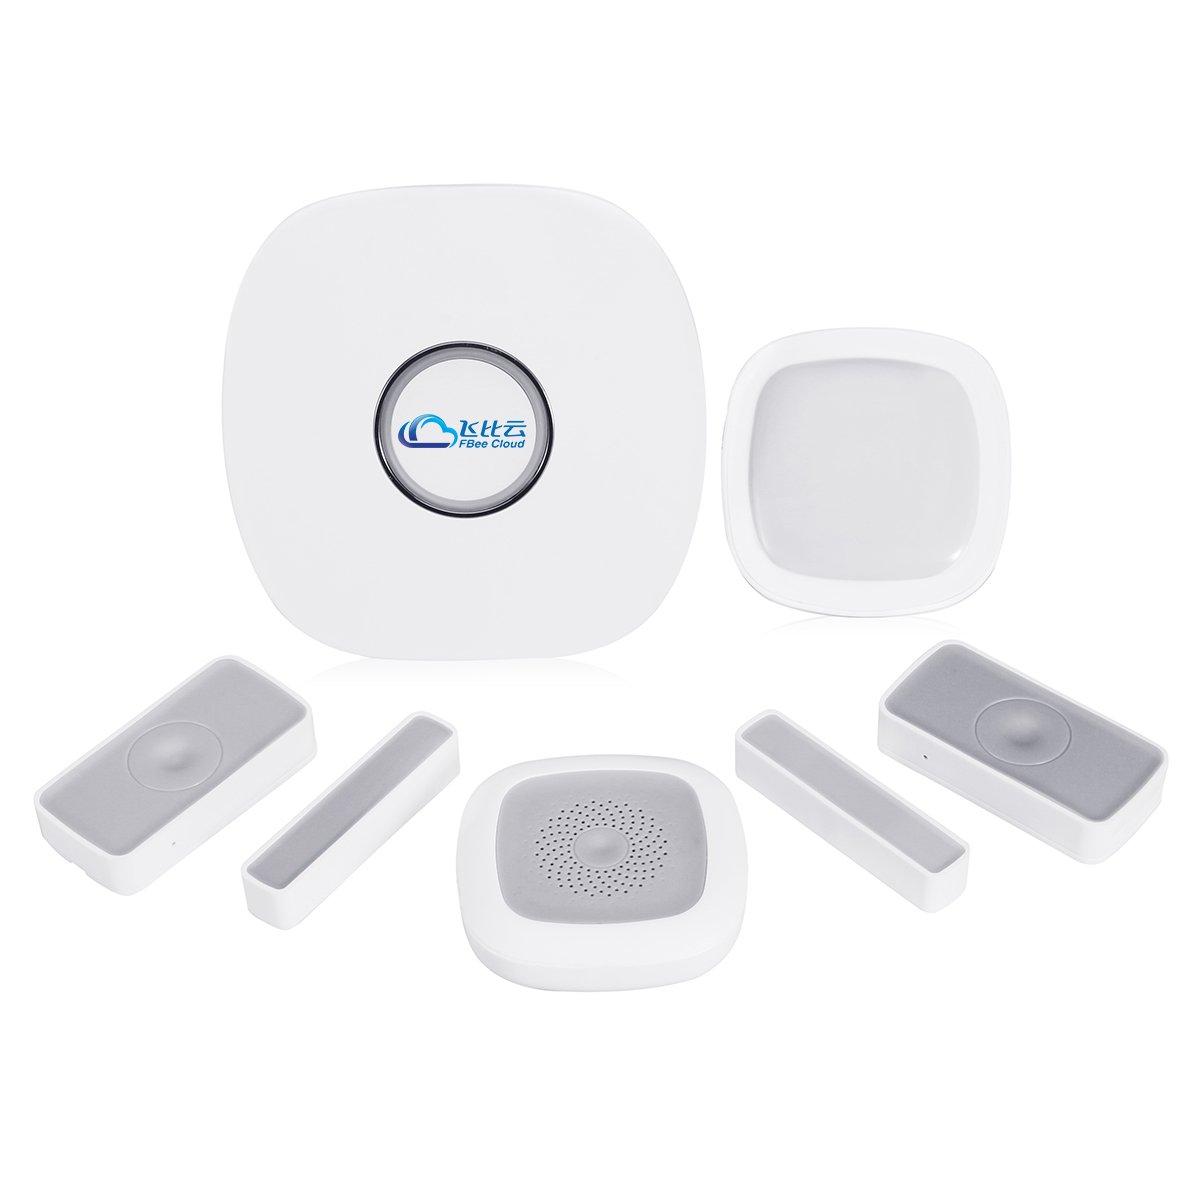 Brimate Smart Home Care Kit 1 Hub 1 Motion Sensor 1 Temp&Humidity Sensor 2 Door Sensors